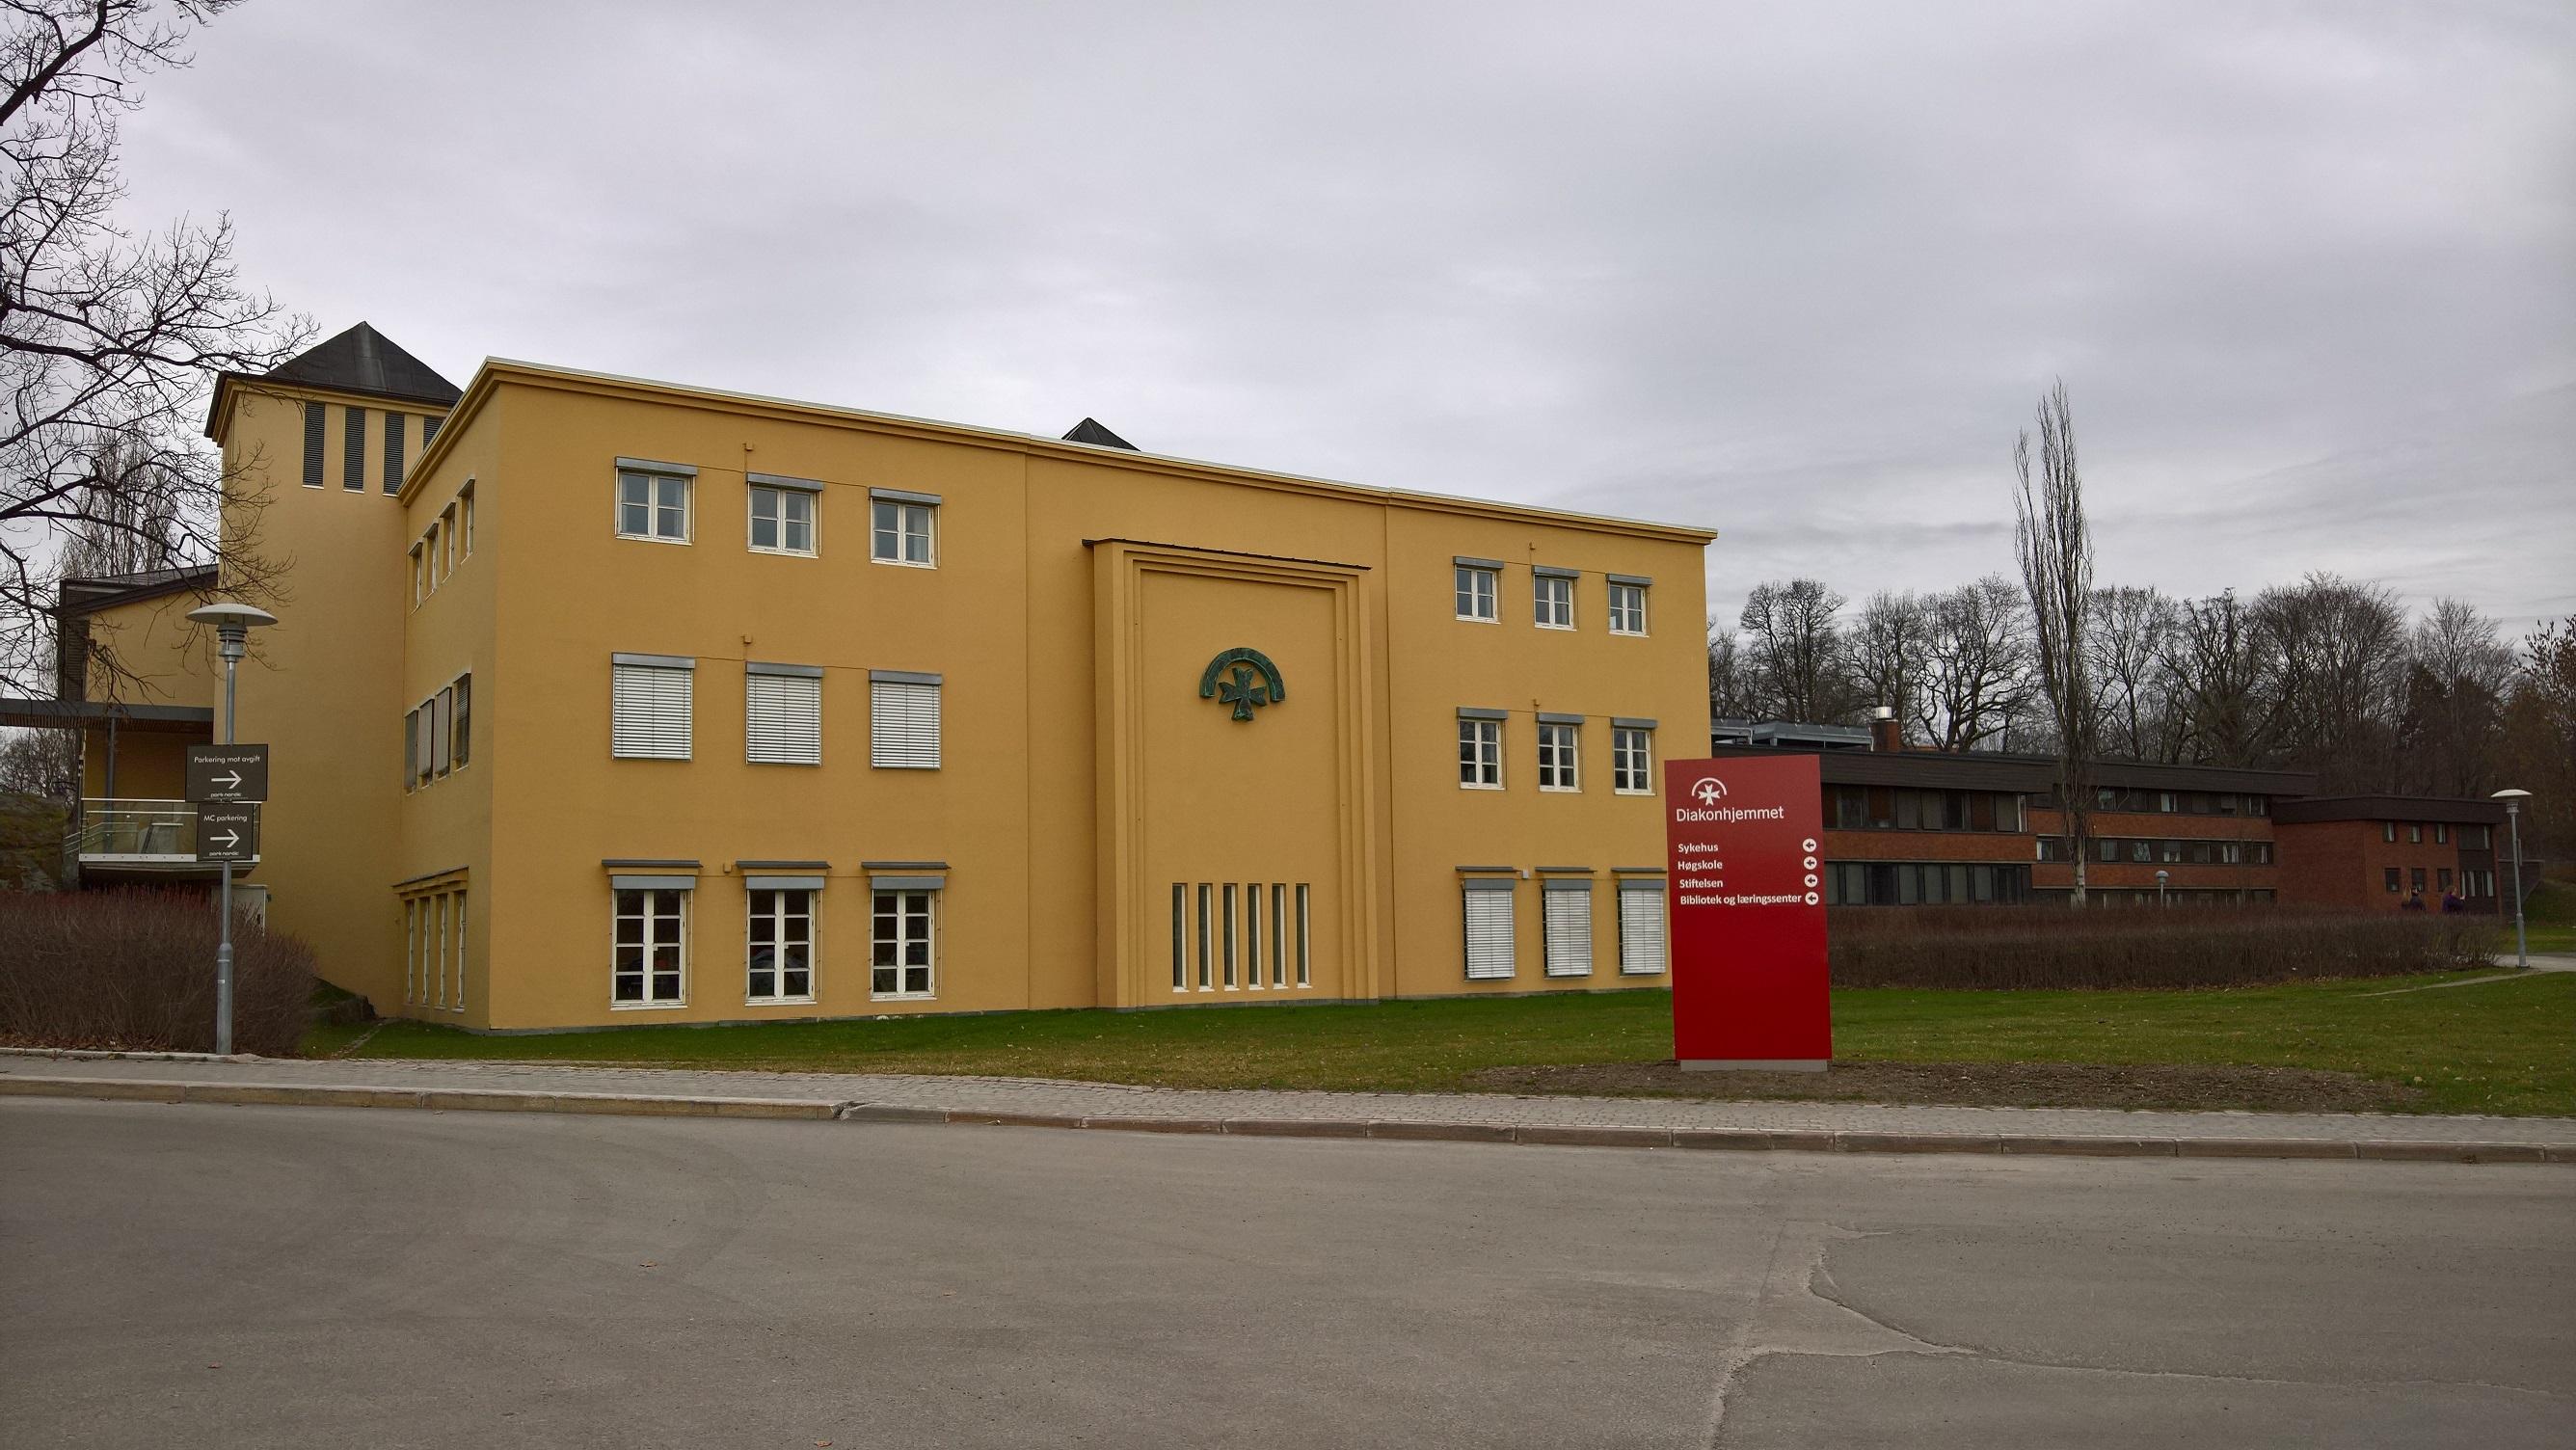 Diagnostik entzündlicher Gelenkerkrankungen nun im Diakonhjemmet Sykehus in Oslo